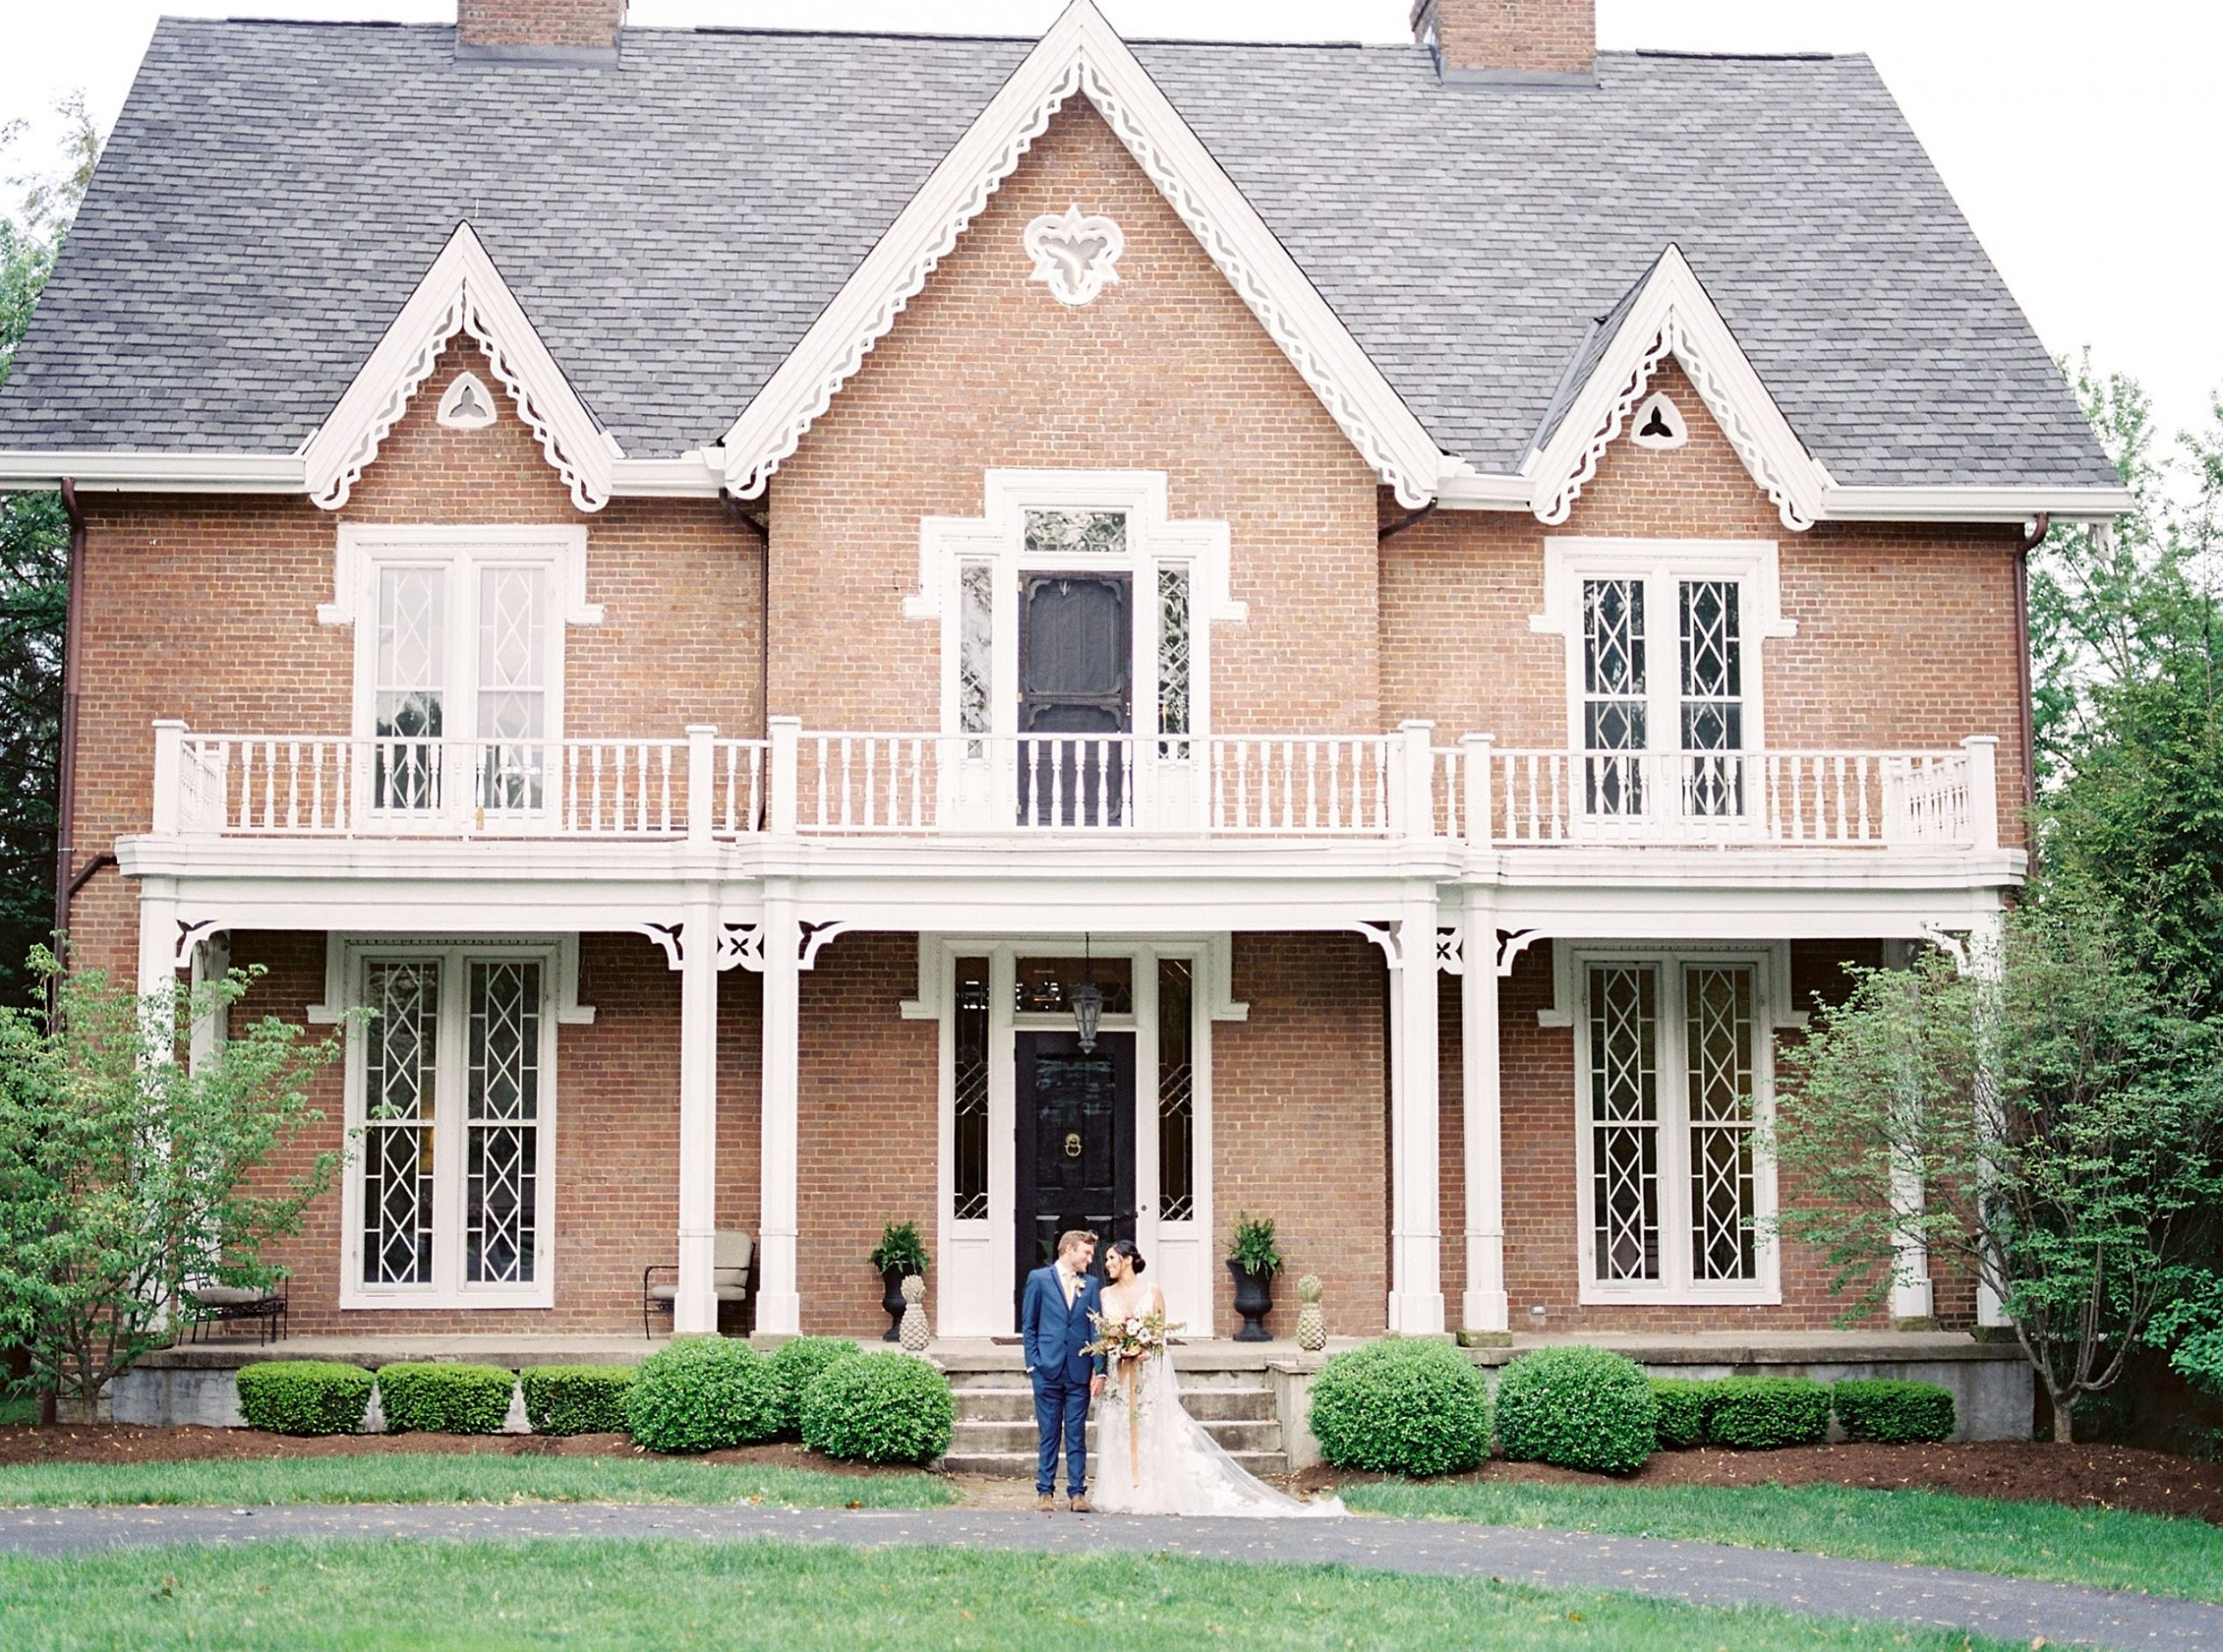 A wedding couple is standing in front of Warrenwood Manor in Kentucky.